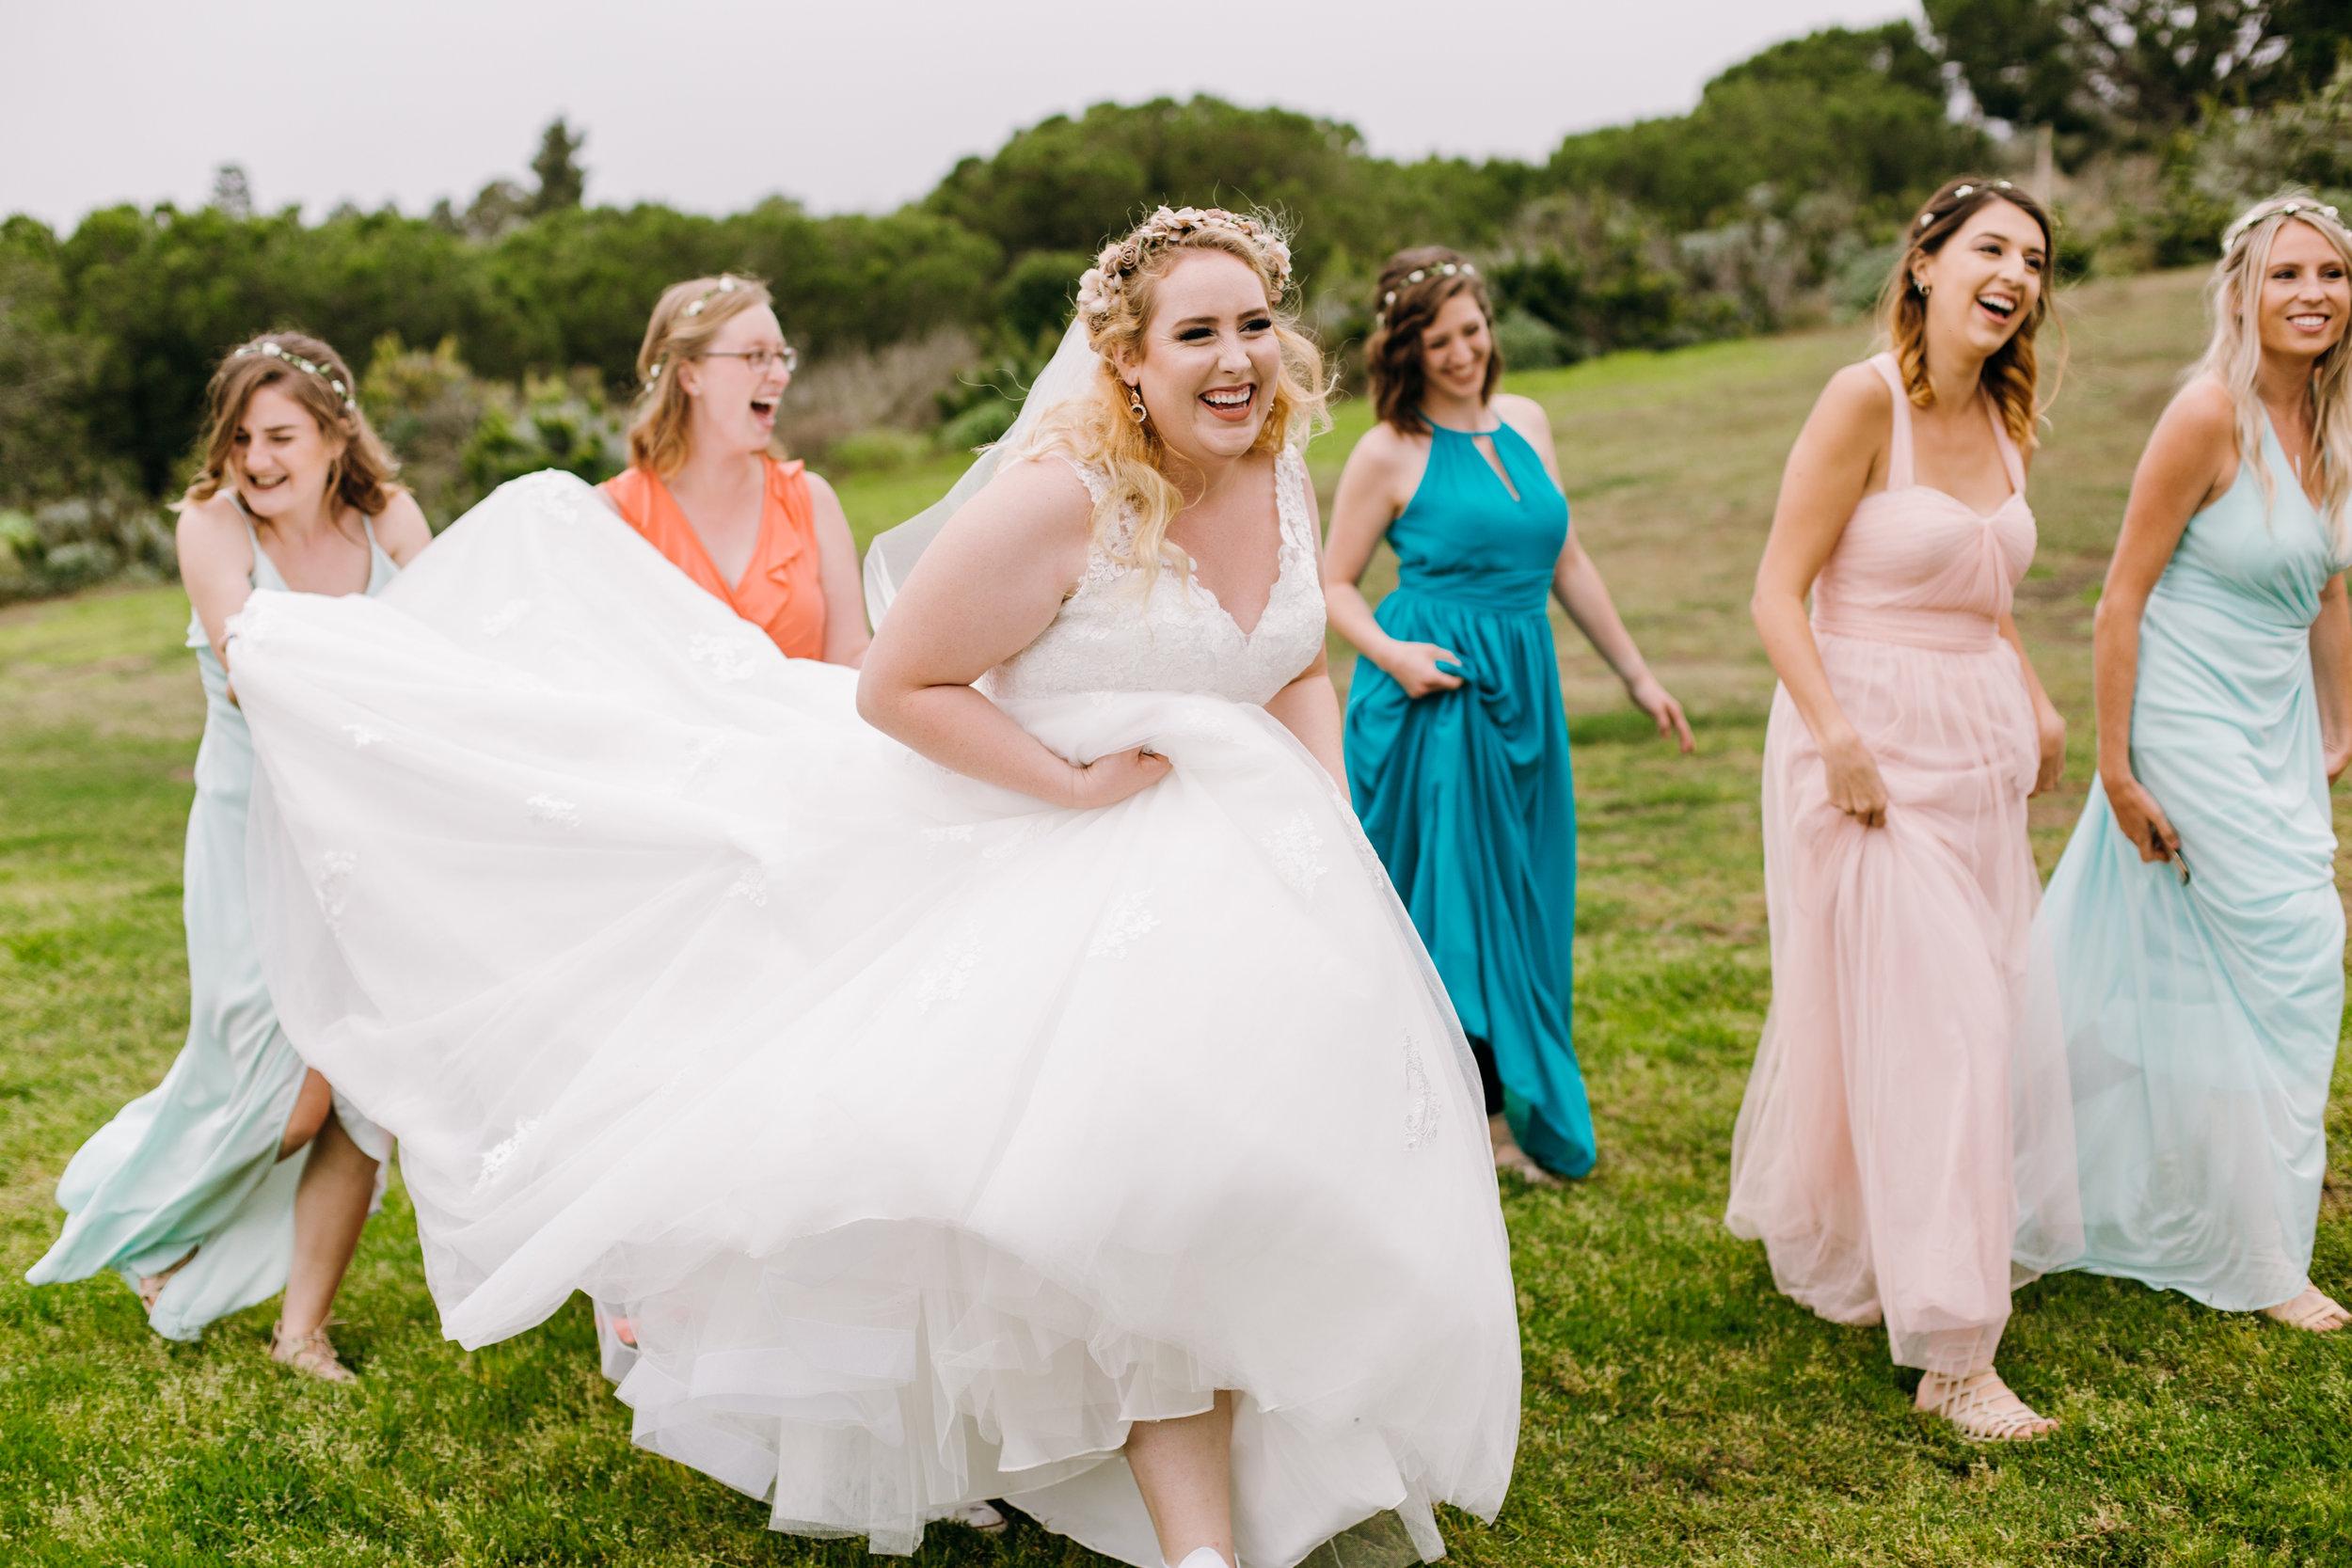 KaraNixonWeddings-PalosVerdes-Wedding-14.jpg